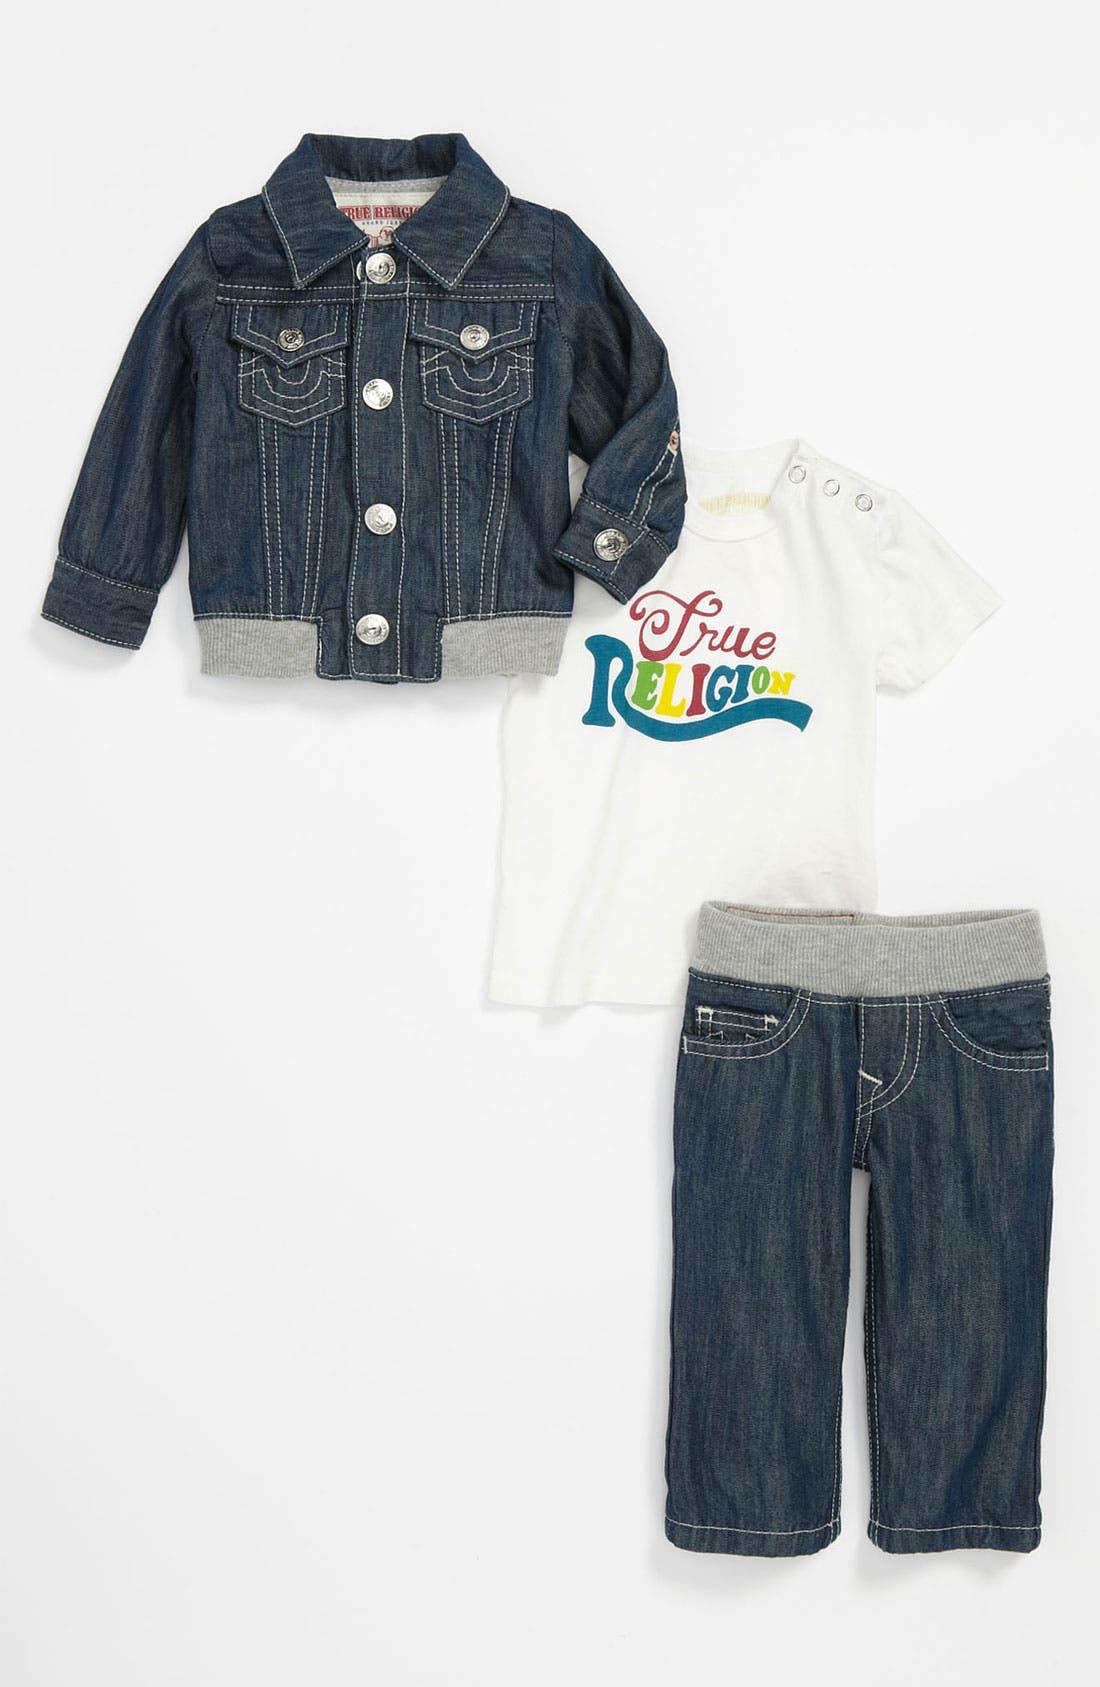 Alternate Image 1 Selected - True Religion Brand Jeans Shirt, Jacket & Jeans Gift Set (Infant)